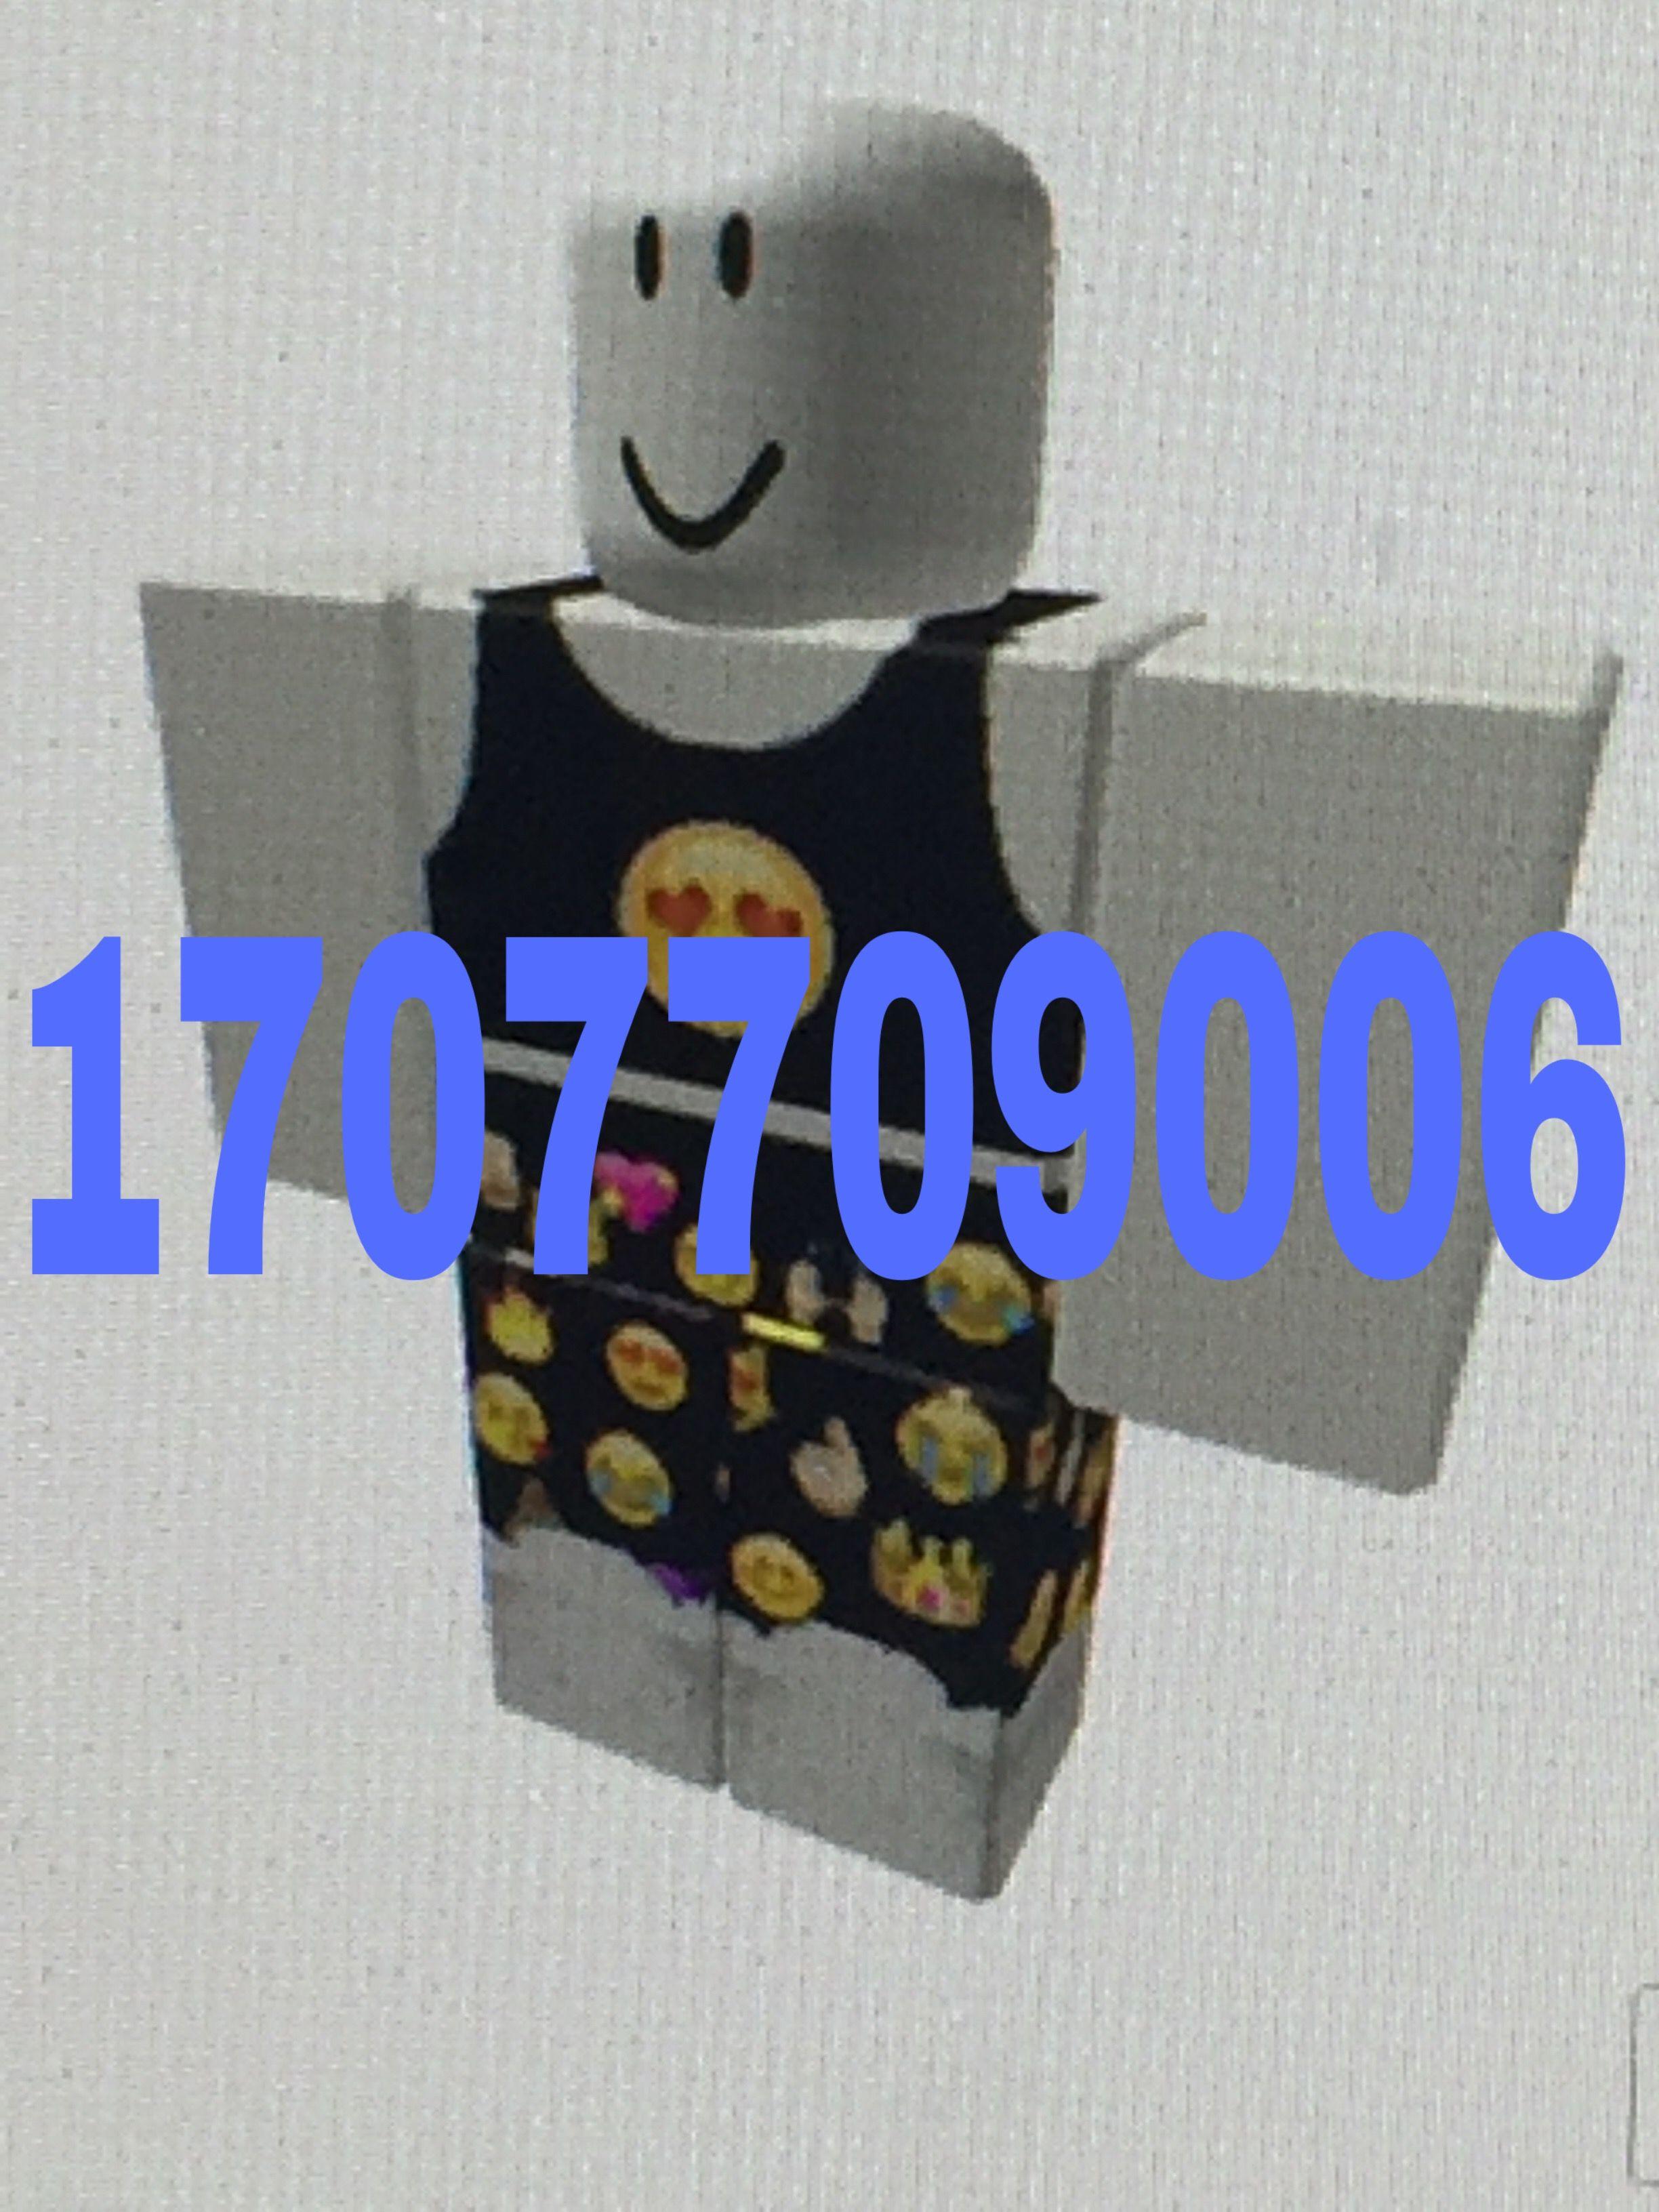 Roblox Shirt Id Roblox High School 2 Pin By Bt21 On Roblox High School Codes Custom Decals Roblox Roblox Codes